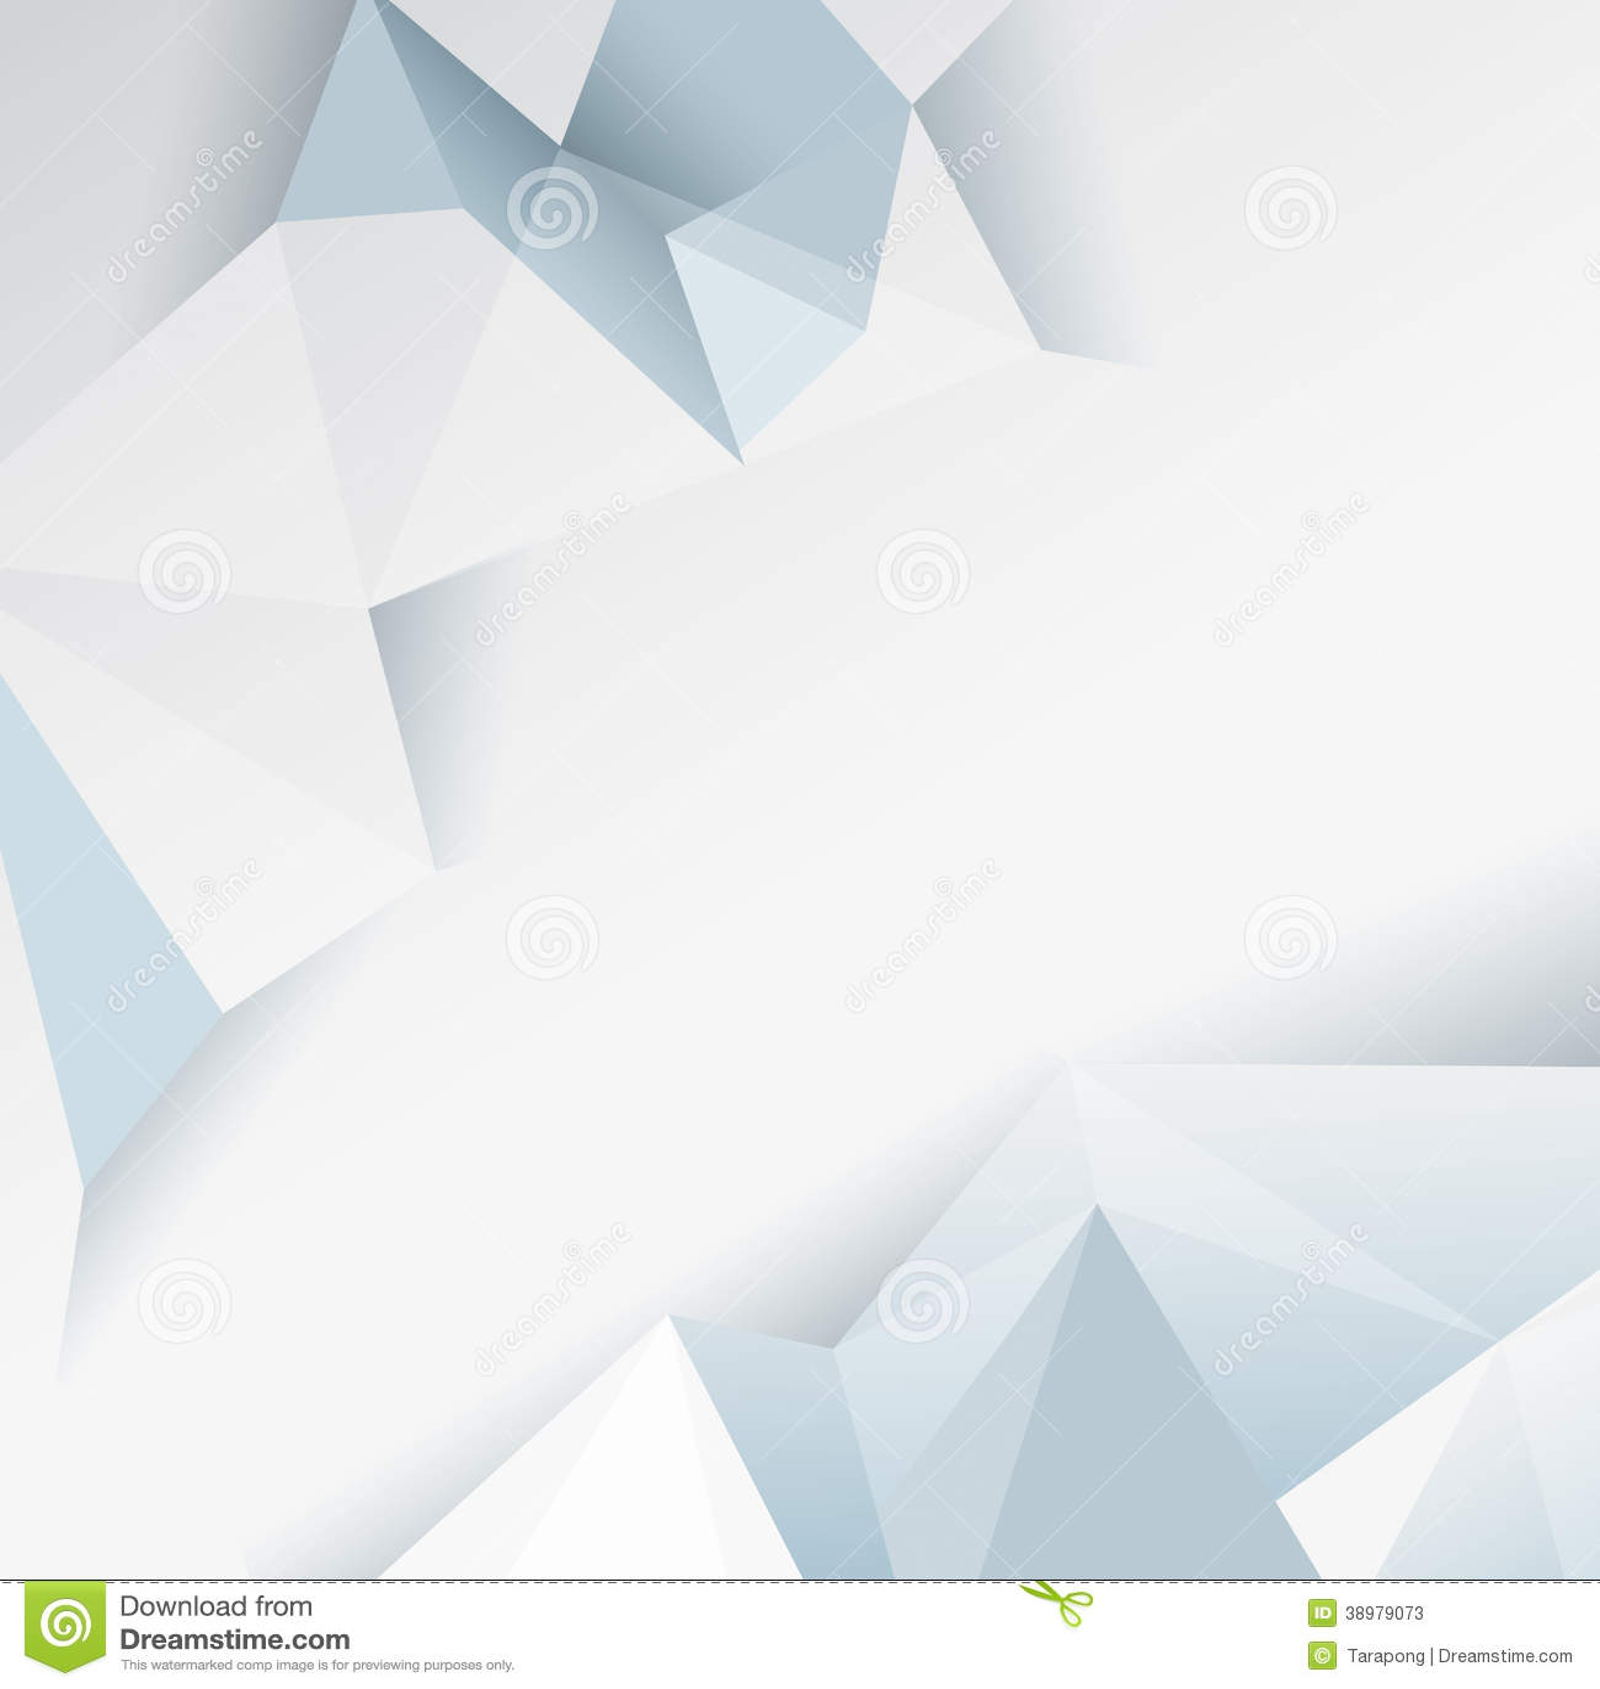 white flyer background